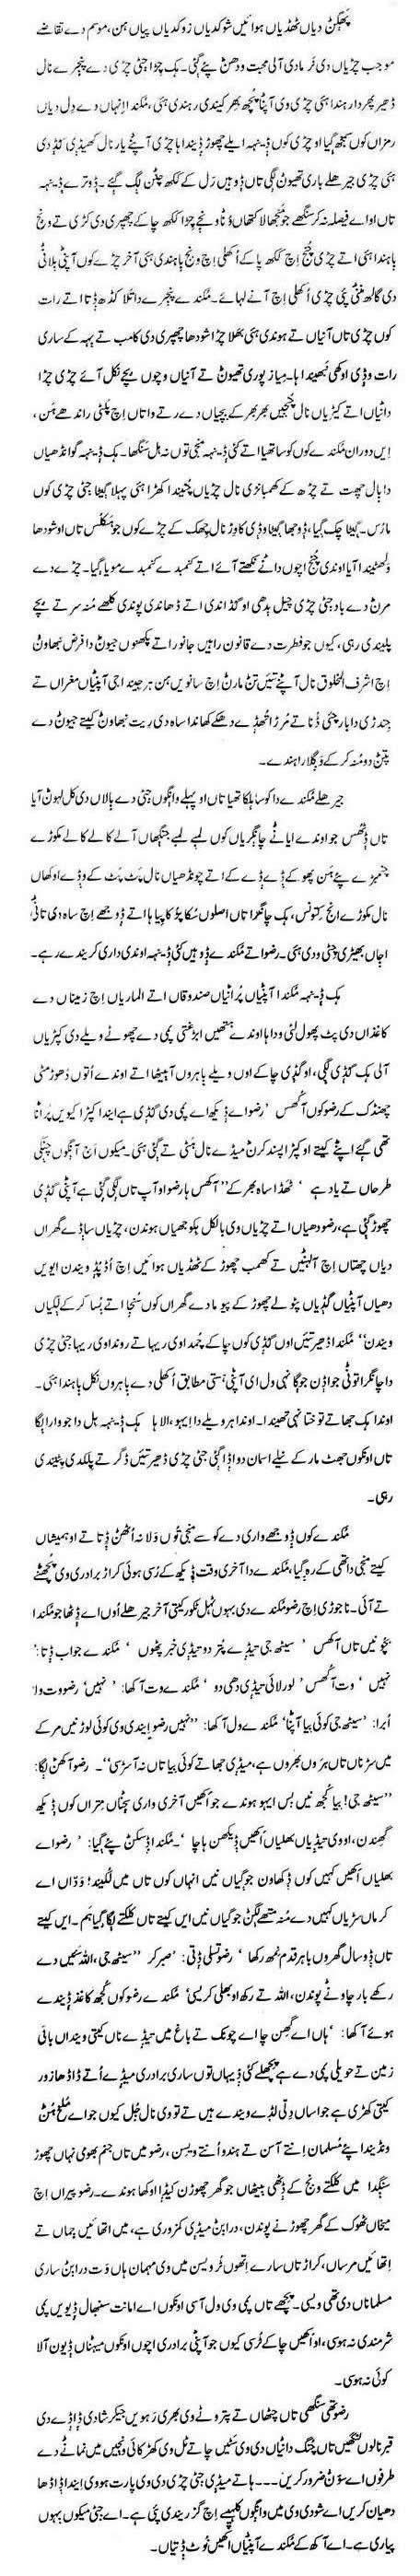 Seraiki Afsana Jatti Chiri (Habib Mohana) Part-3